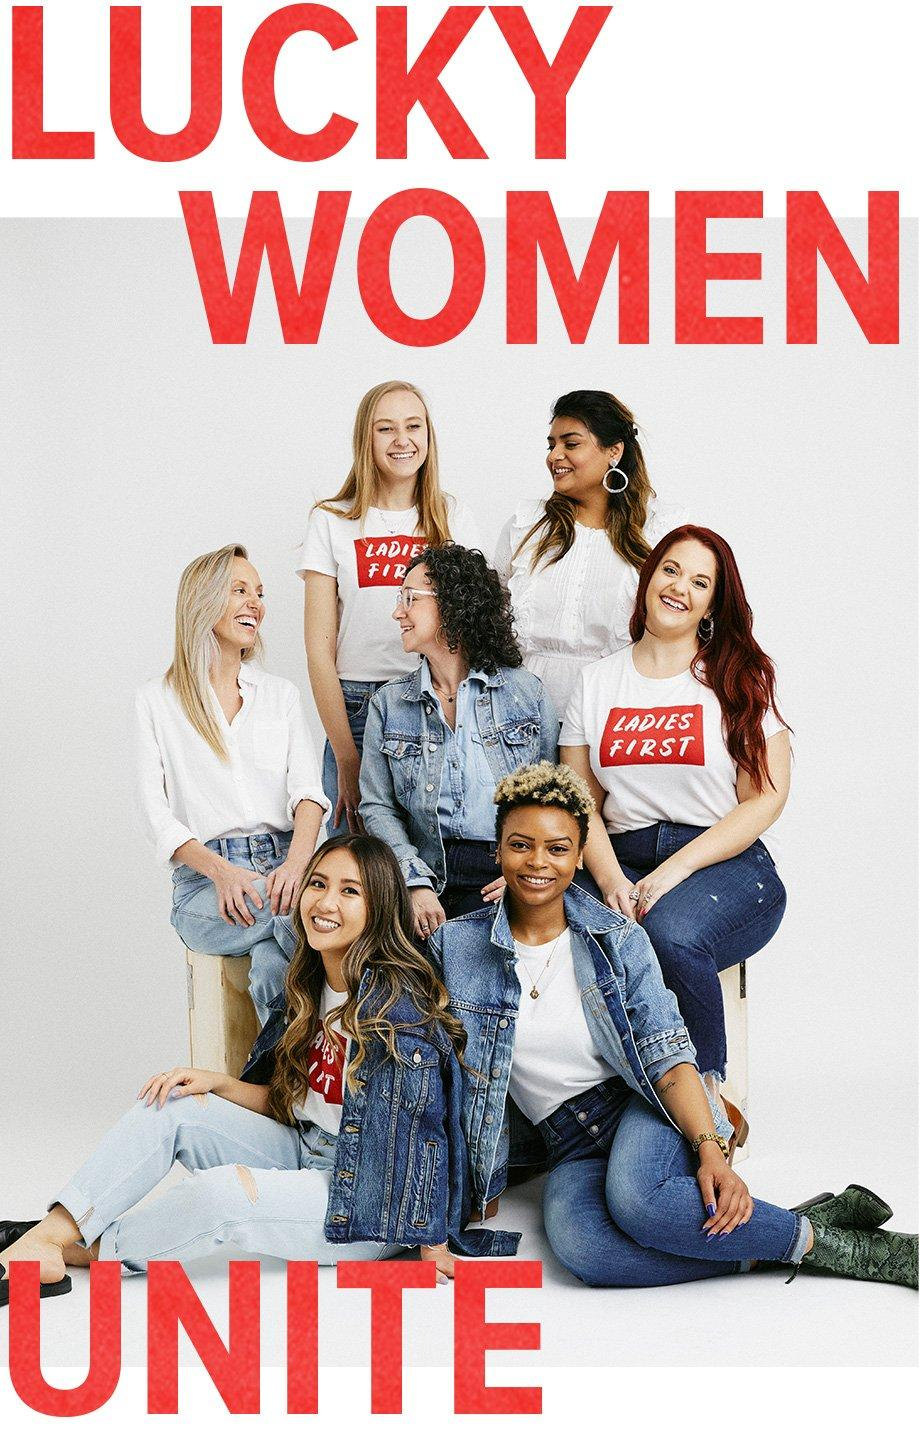 Lucky Women Unite